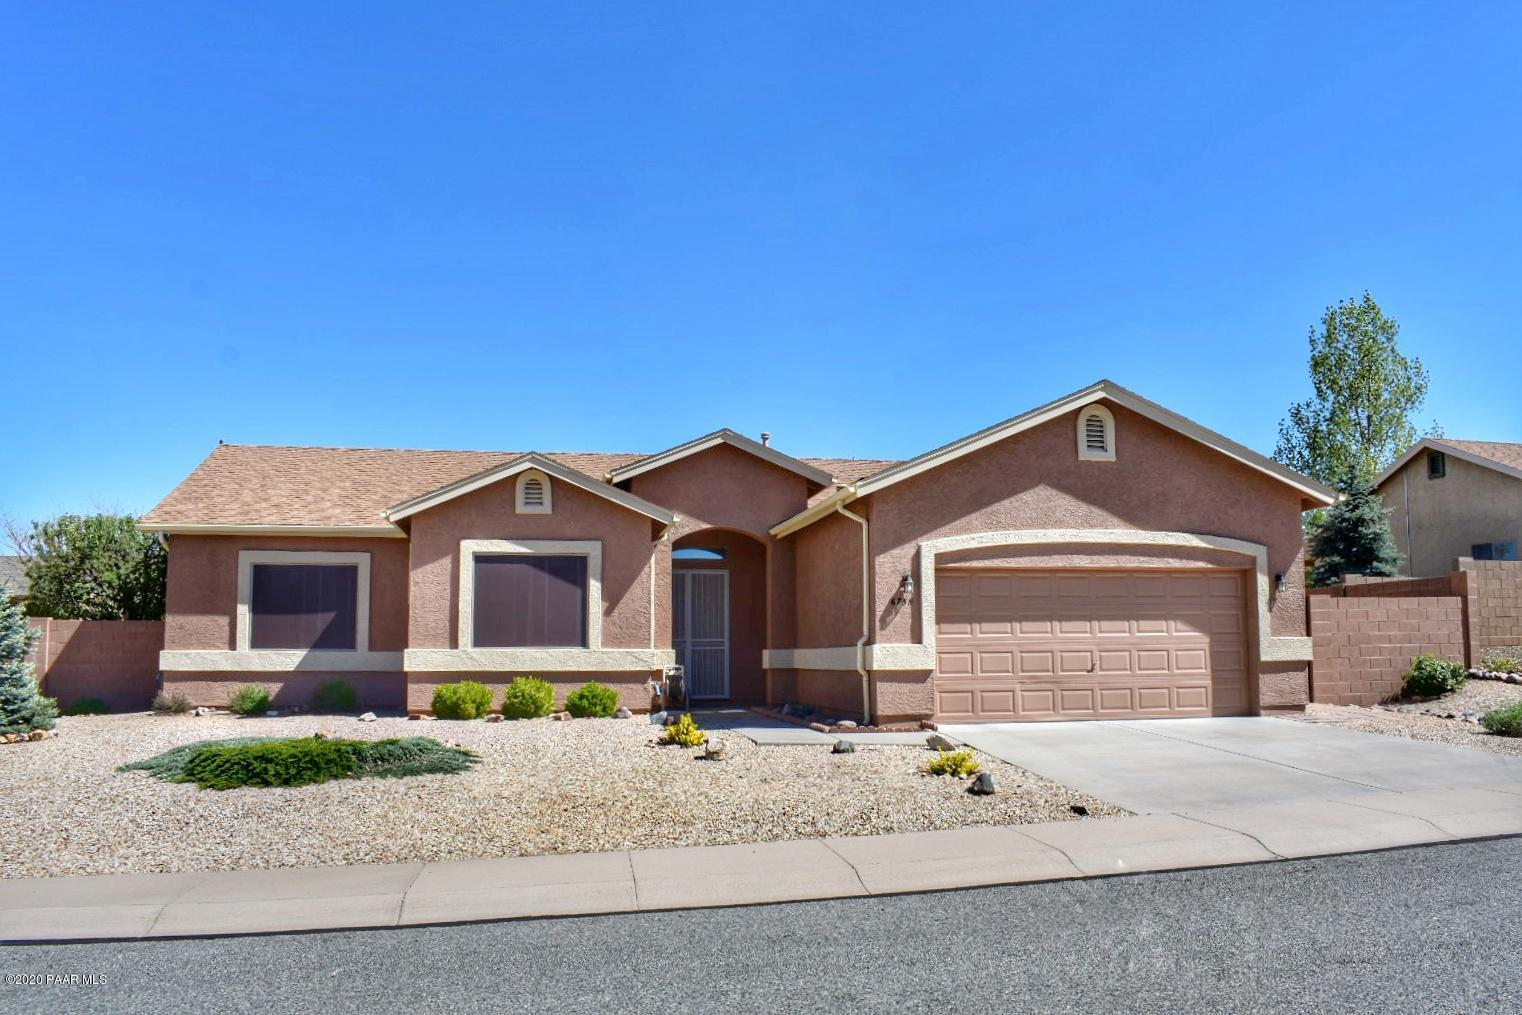 Photo of 6735 Desperado, Prescott Valley, AZ 86314